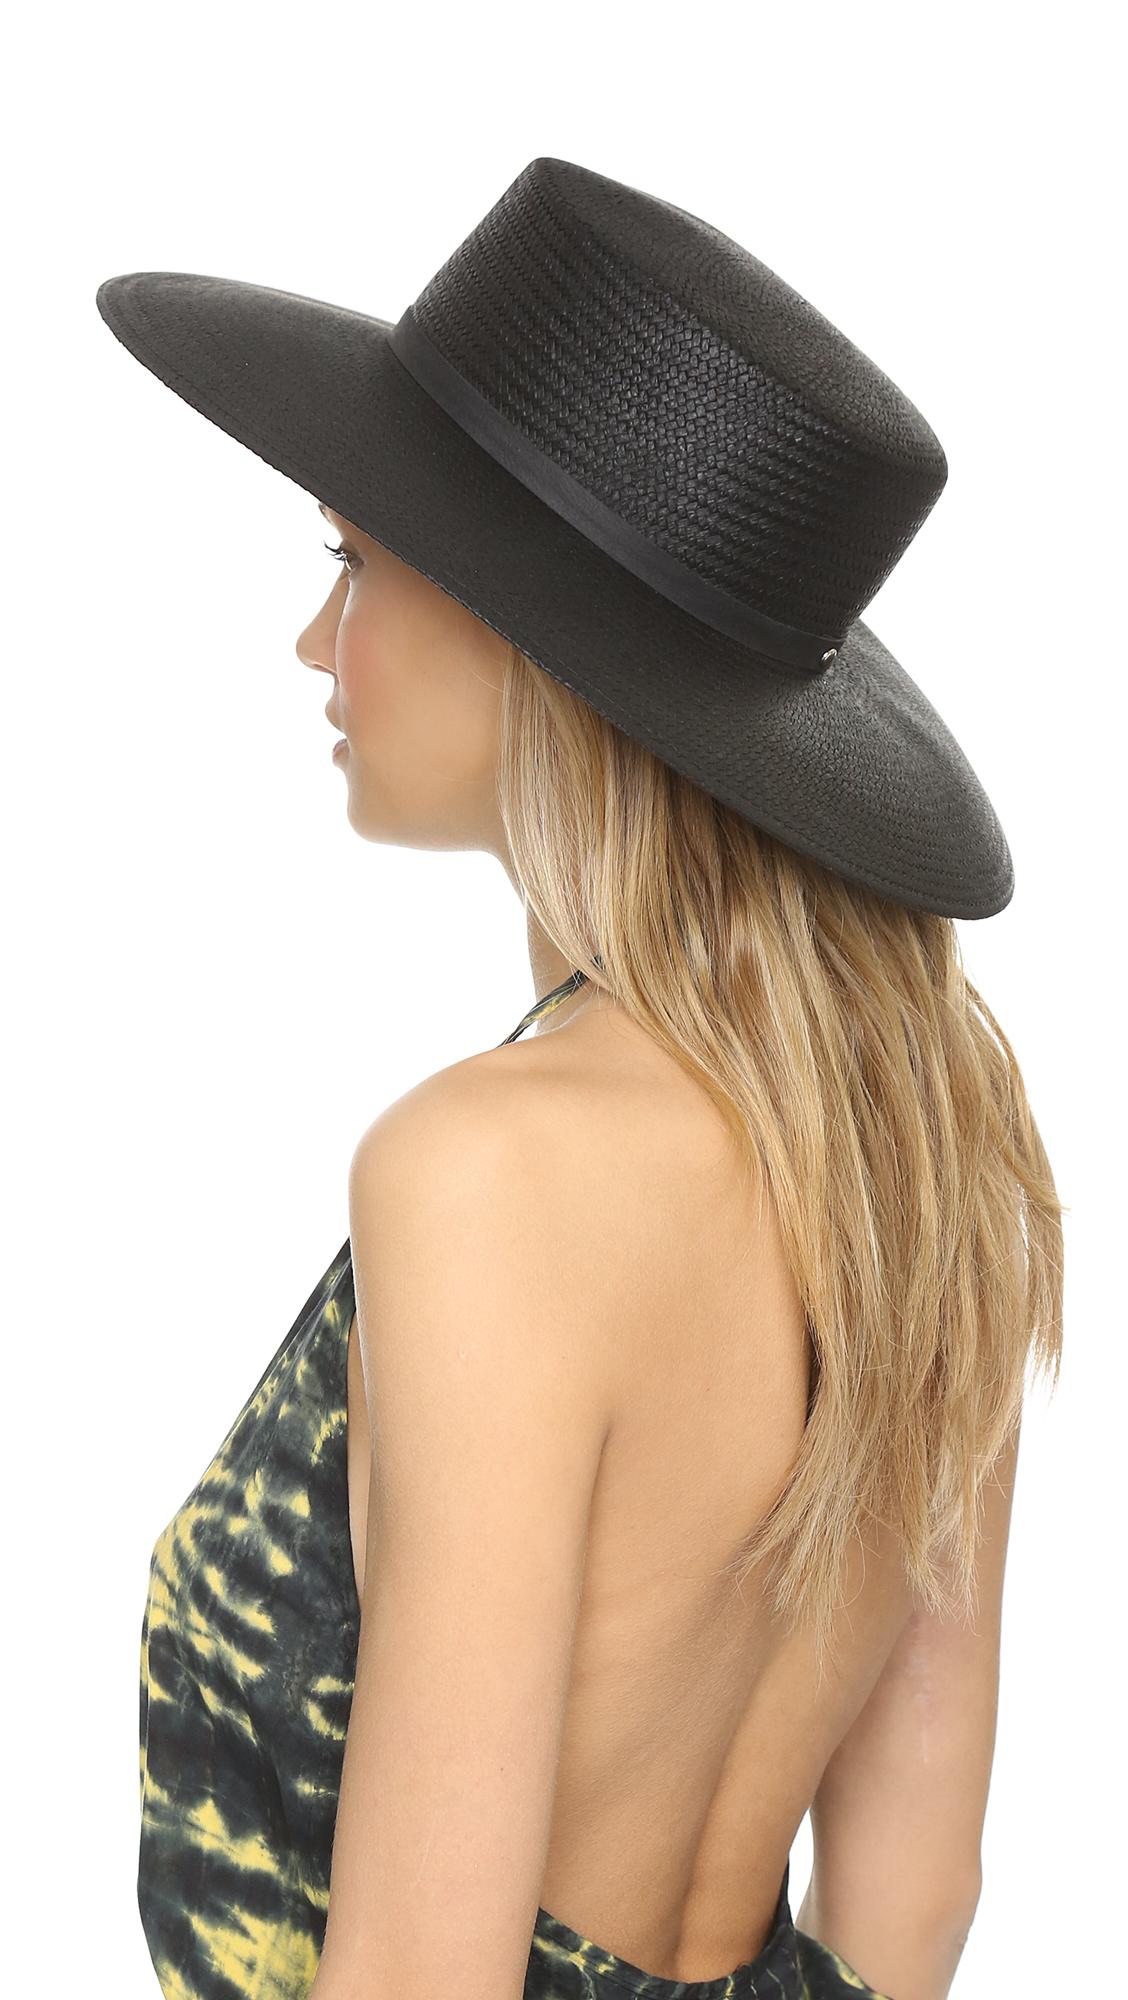 Lyst - Janessa Leone Jalk Hat - Black in Black 7ba645686fde